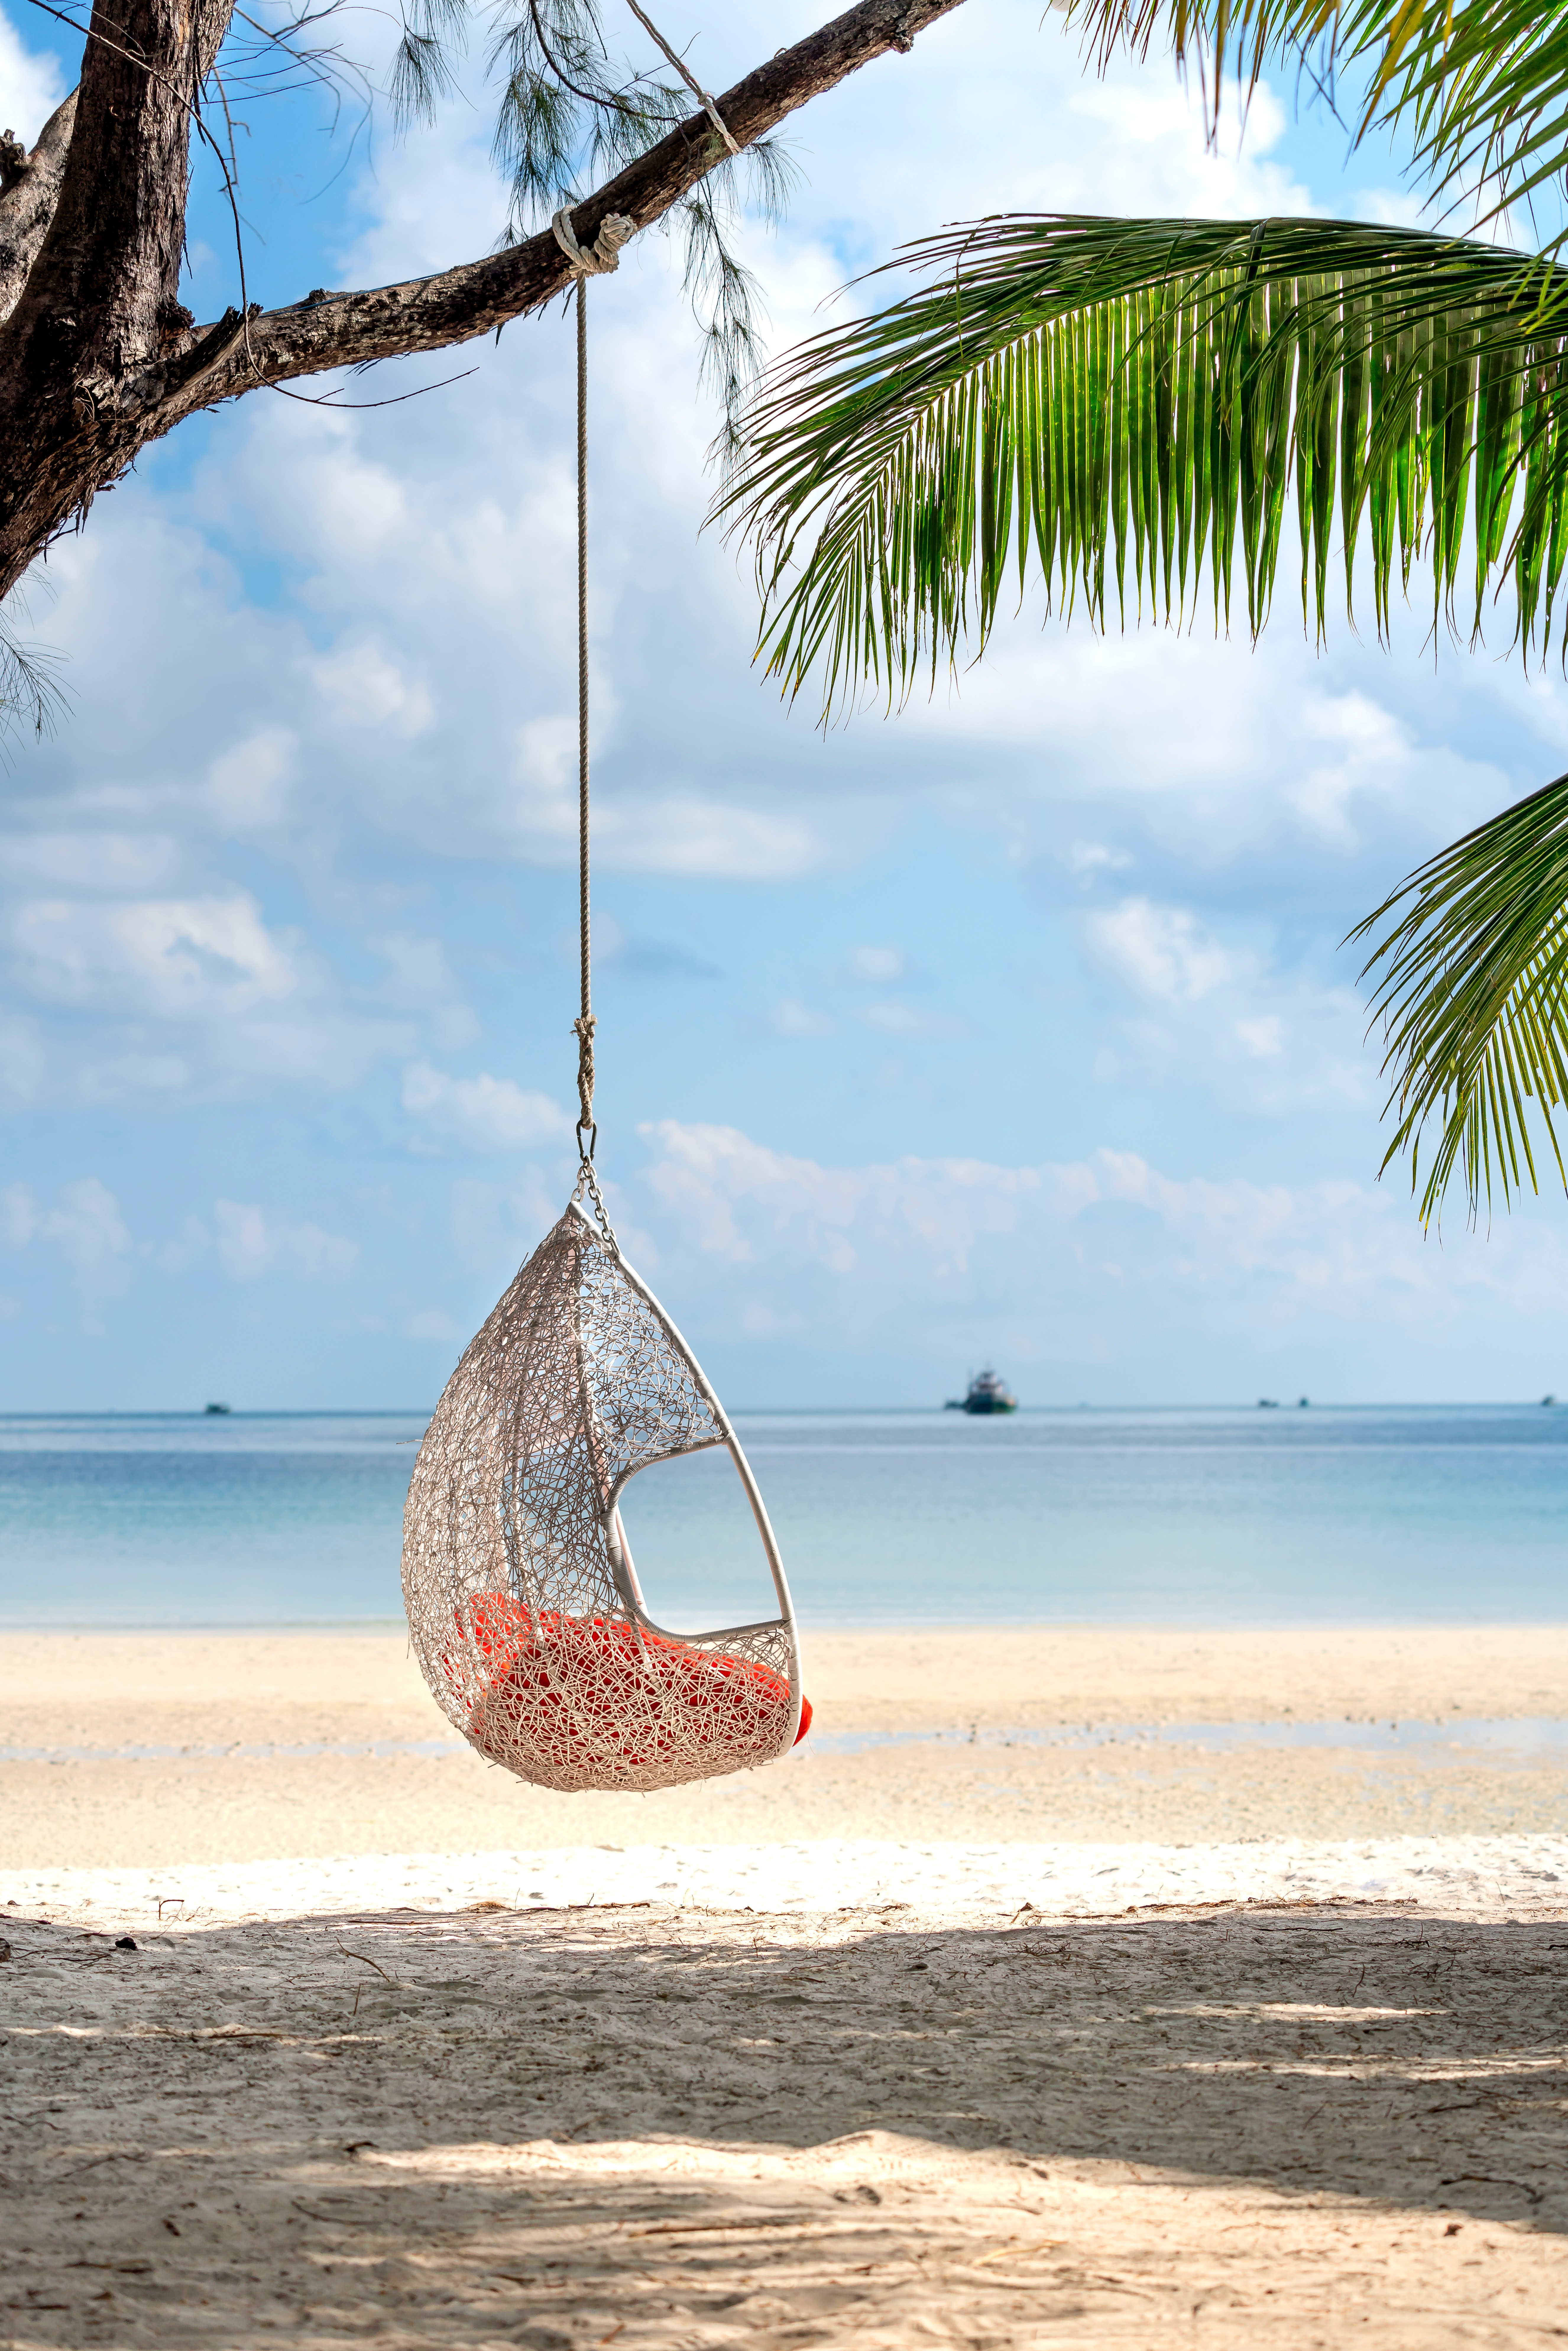 Beach hammock chair resort tropical island